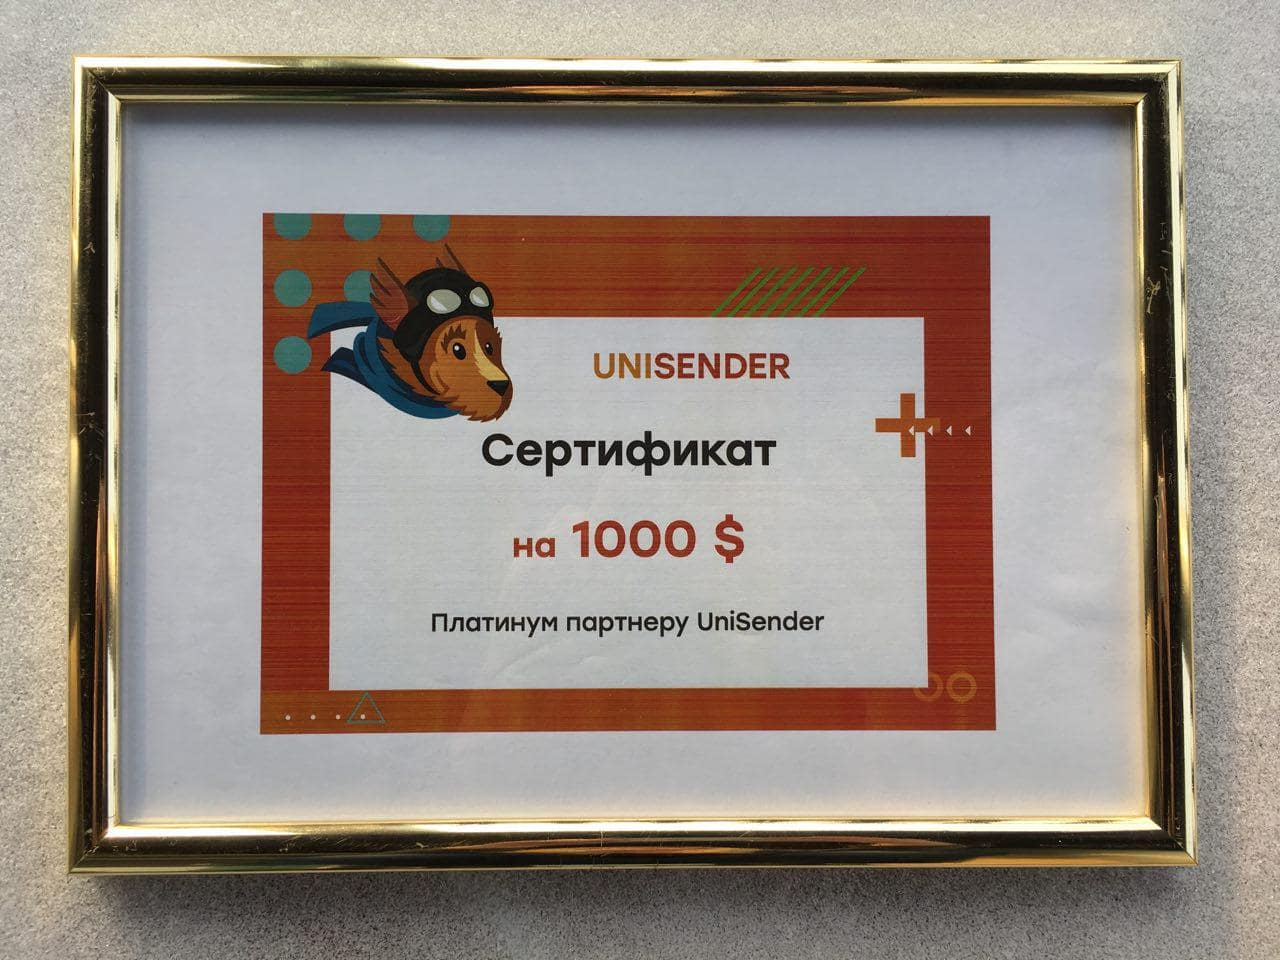 Сертификат Platinum-партнёра UniSender